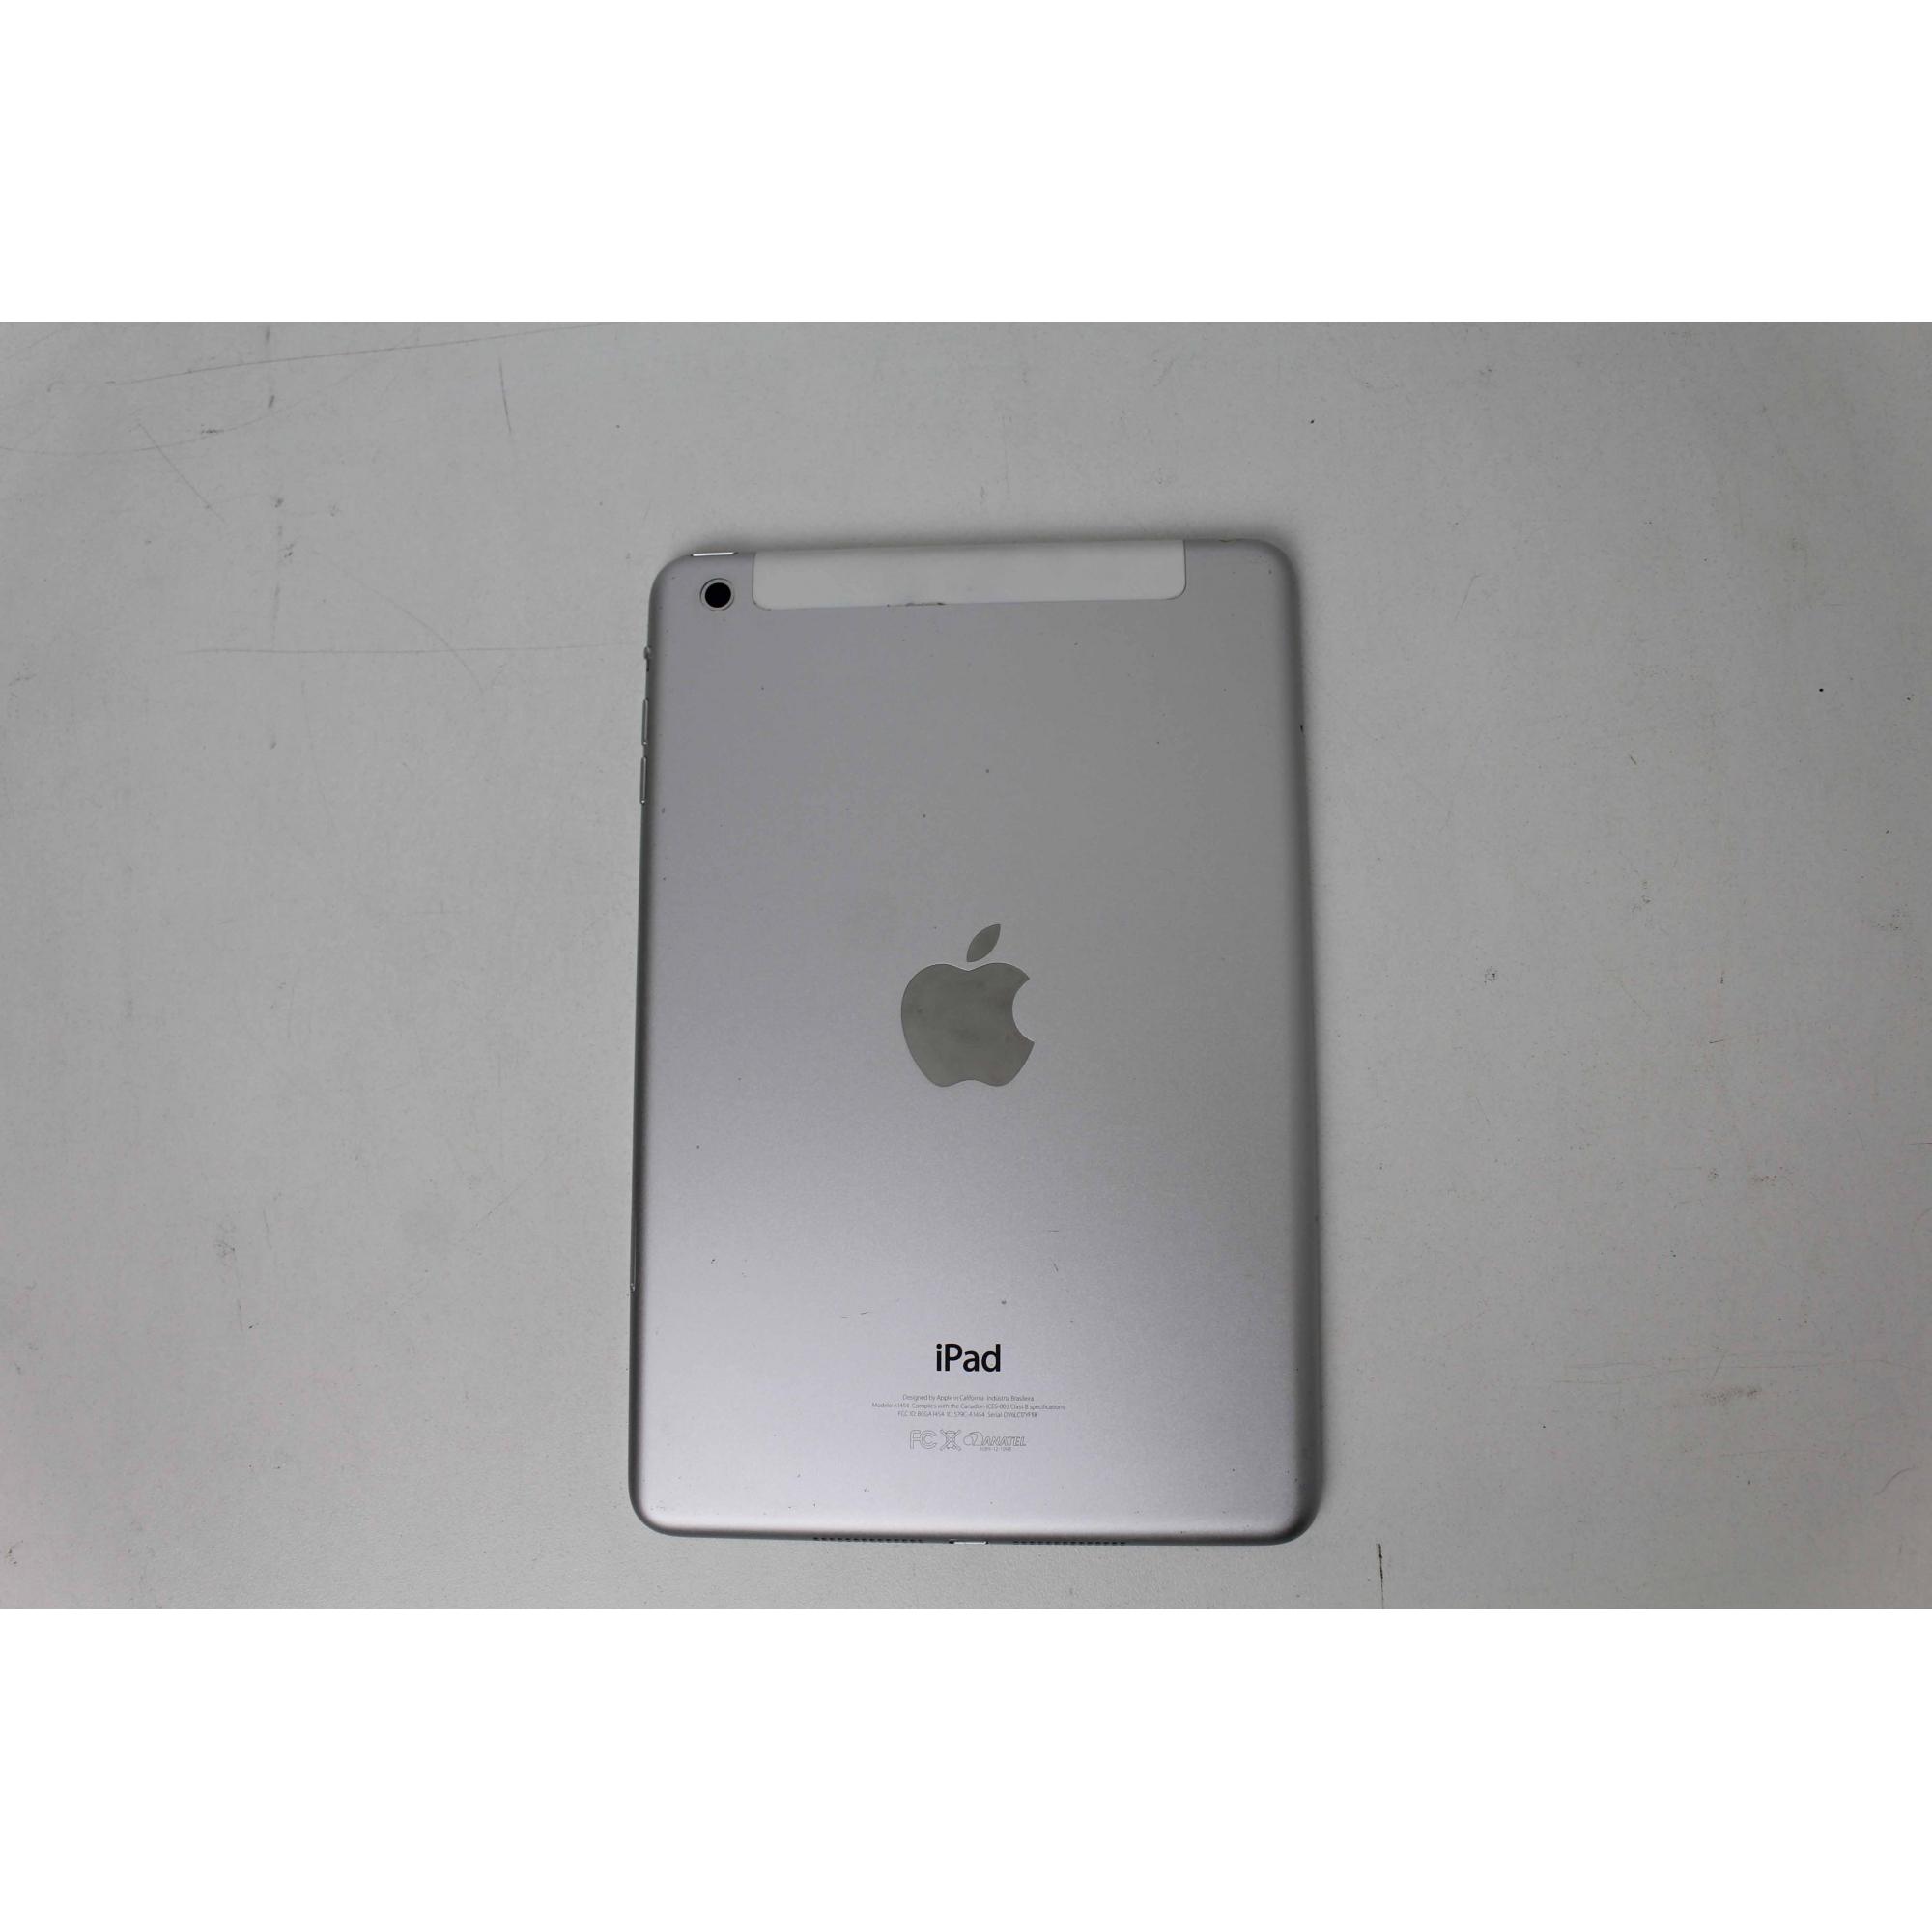 "IPAD MINI 1 MD537BR/A 7.9"" 16GB WIFI / 4G - SILVER"